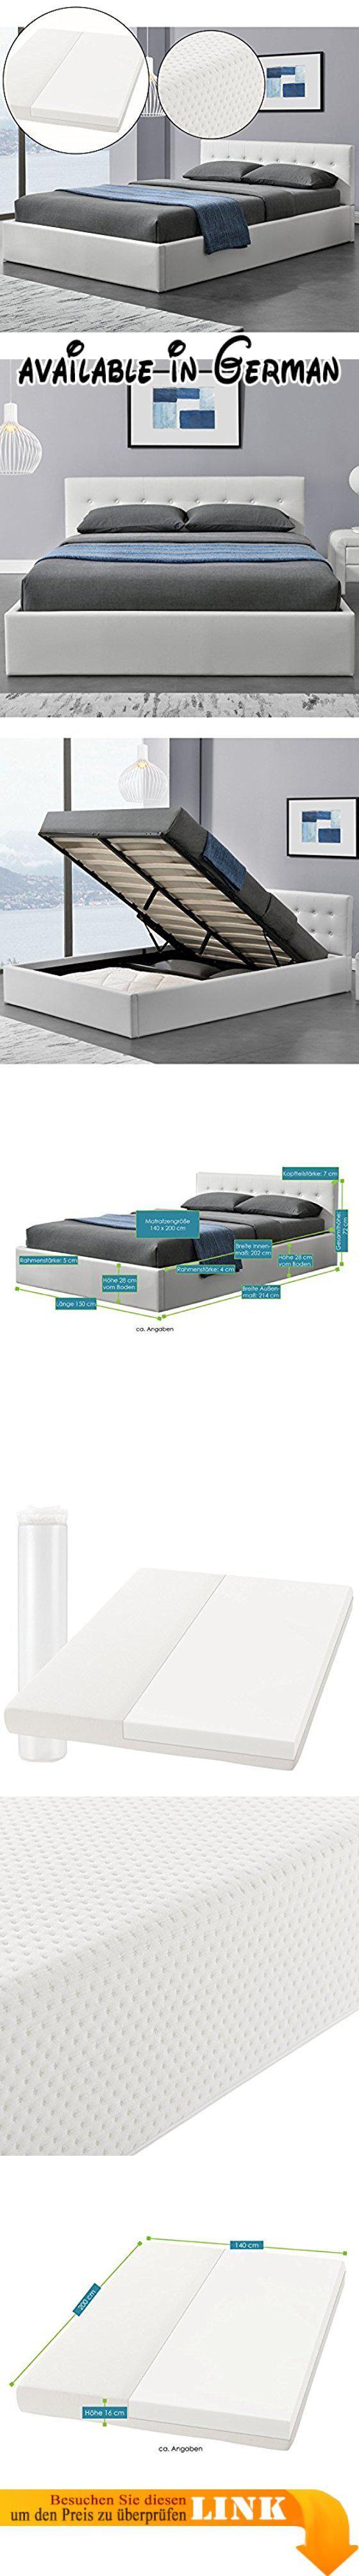 Anana Designer Sitzmobel Weicher Stoff Aqua Creations: Moderne